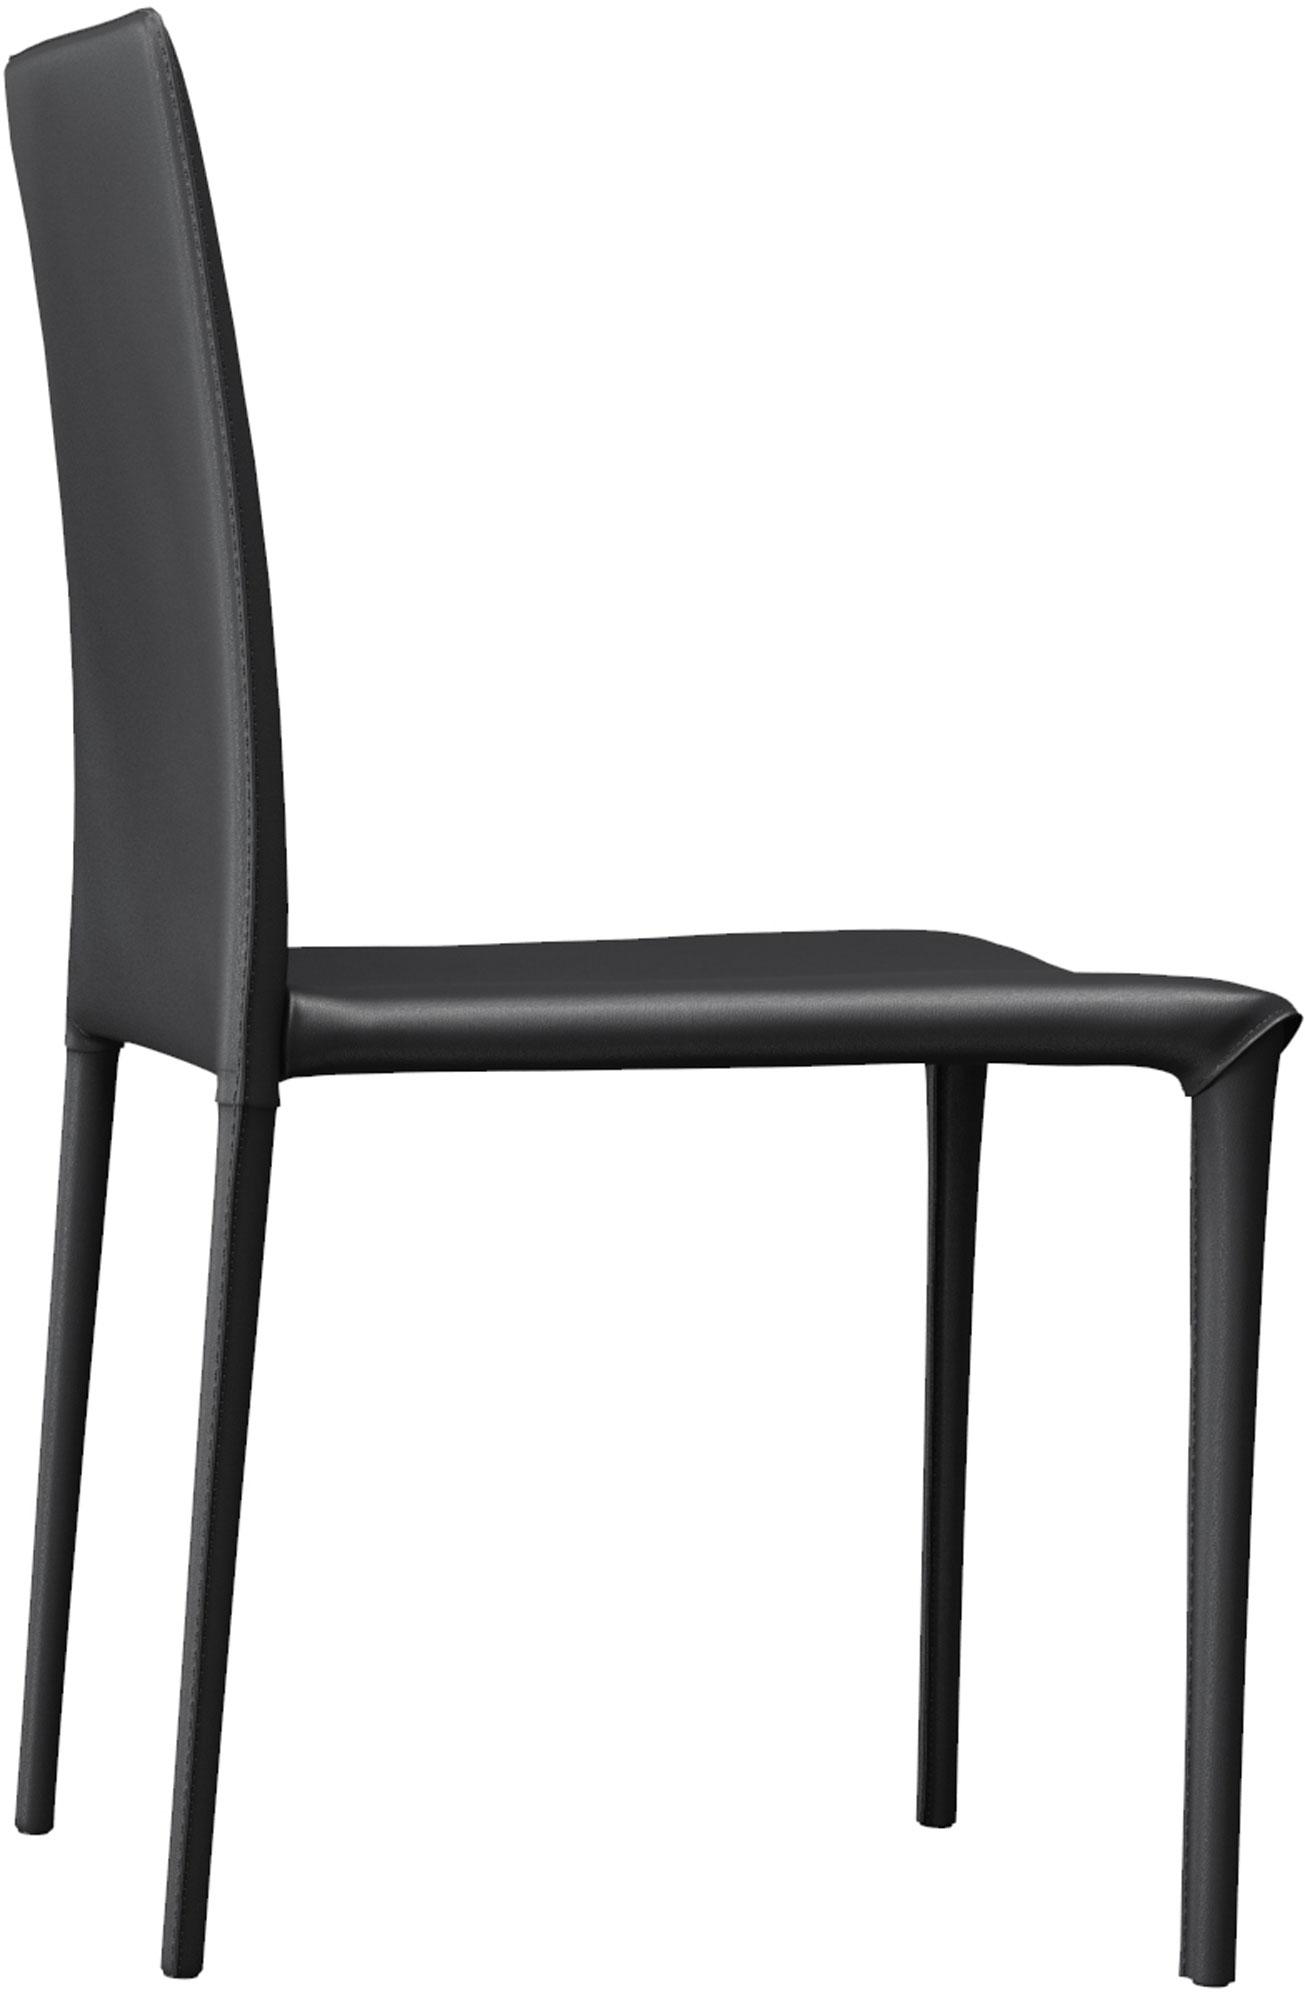 Varick Chair